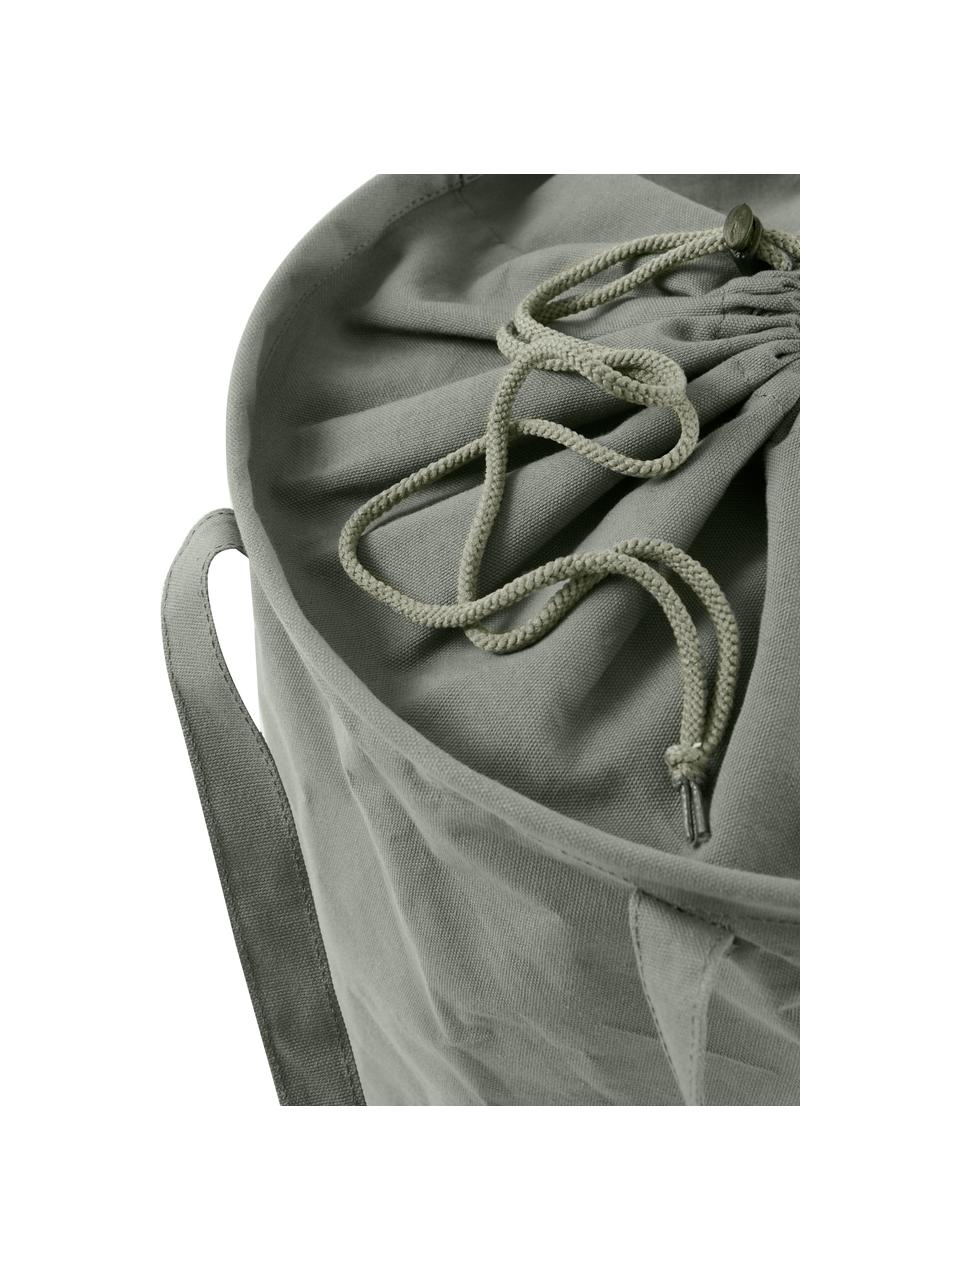 Wäschekorb Amore, Kunstfaser, Grau, Ø 35 x H 55 cm